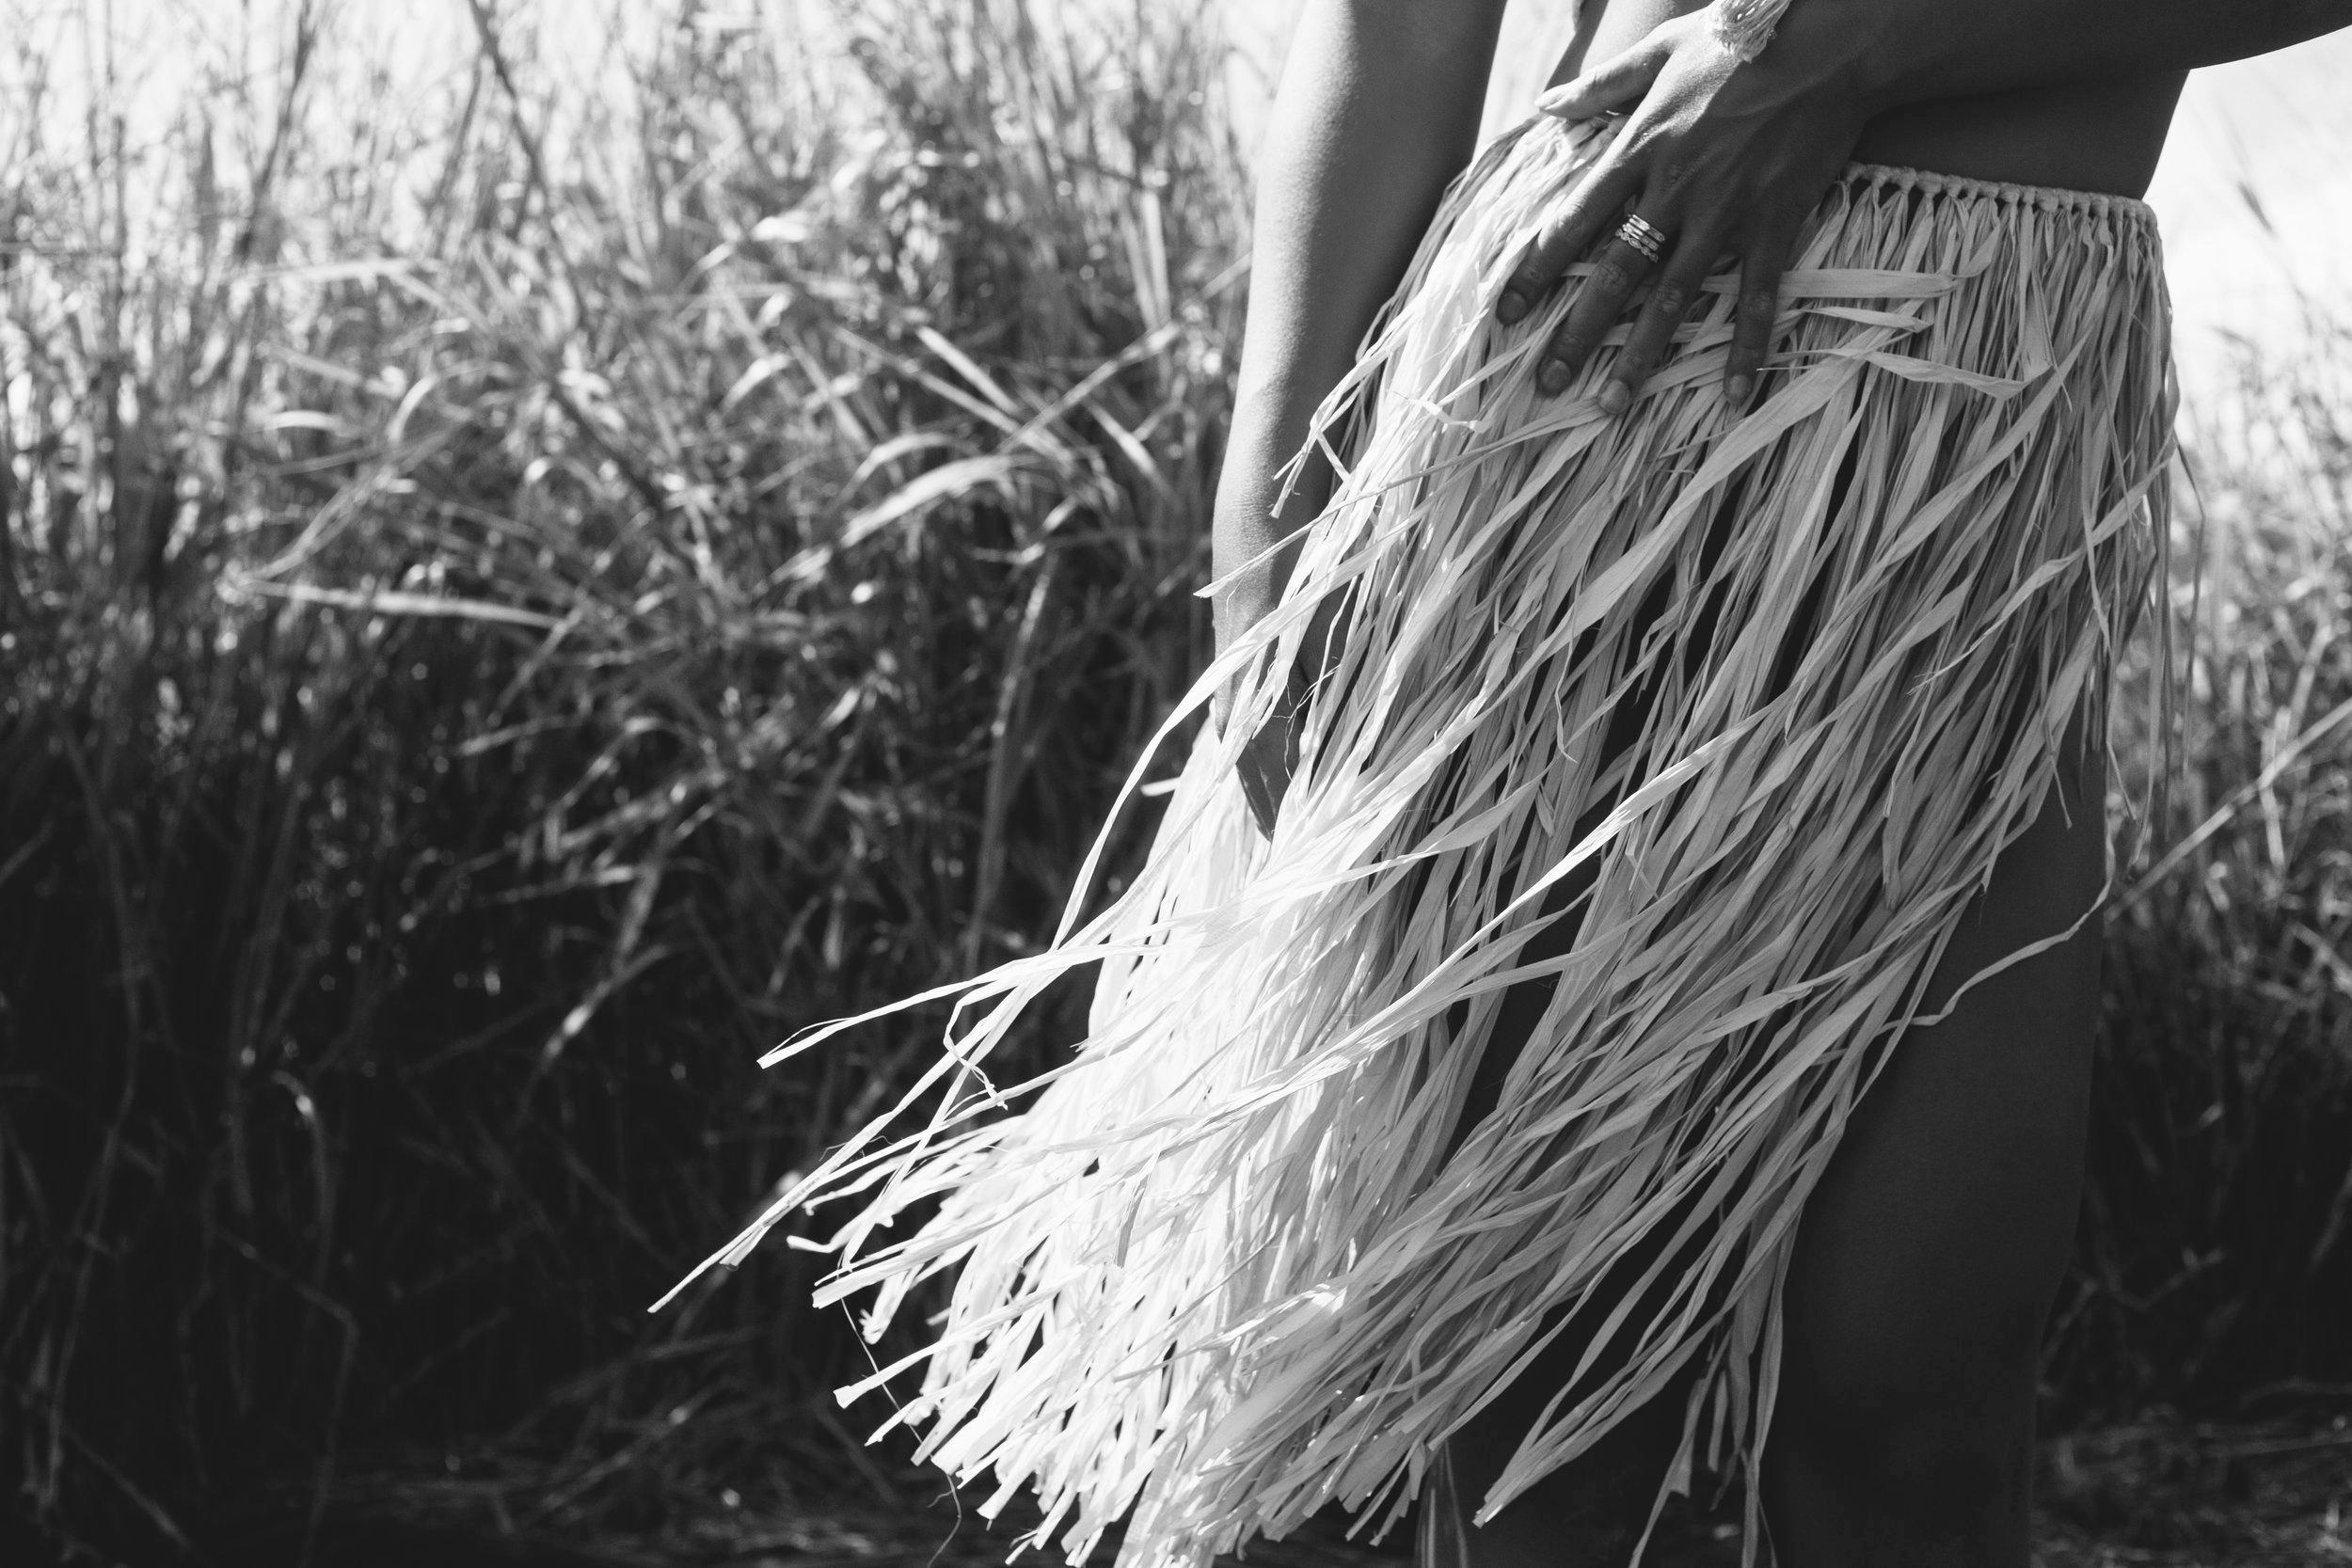 Hawaiian Vibes - Mahina Garcia - AROSE TRAVELS